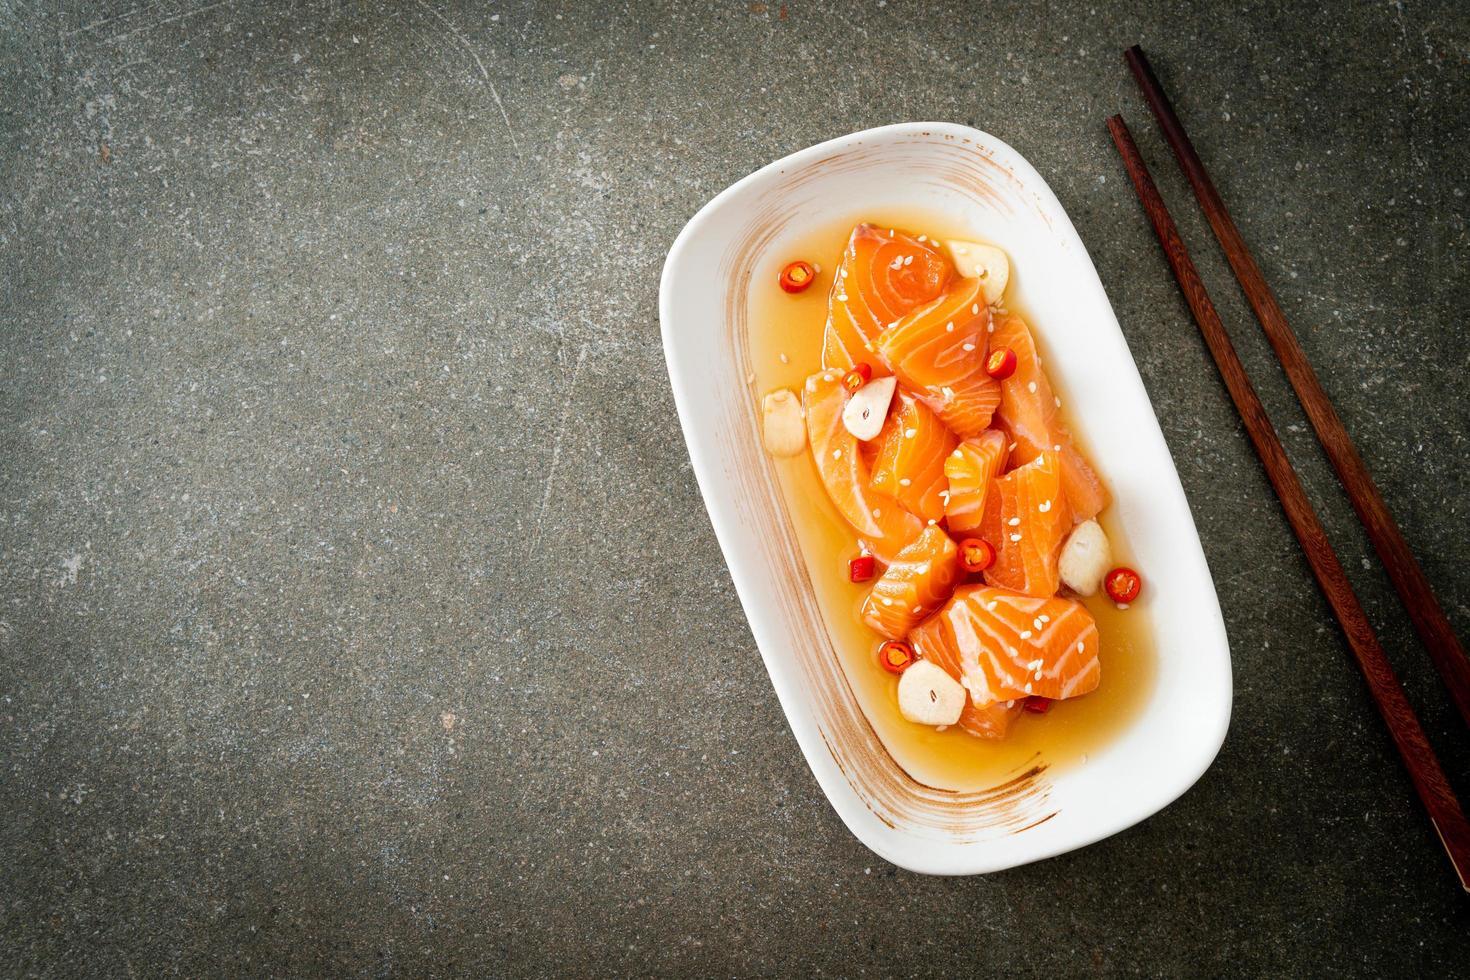 salmone fresco crudo marinato shoyu o salsa di soia marinata al salmone foto